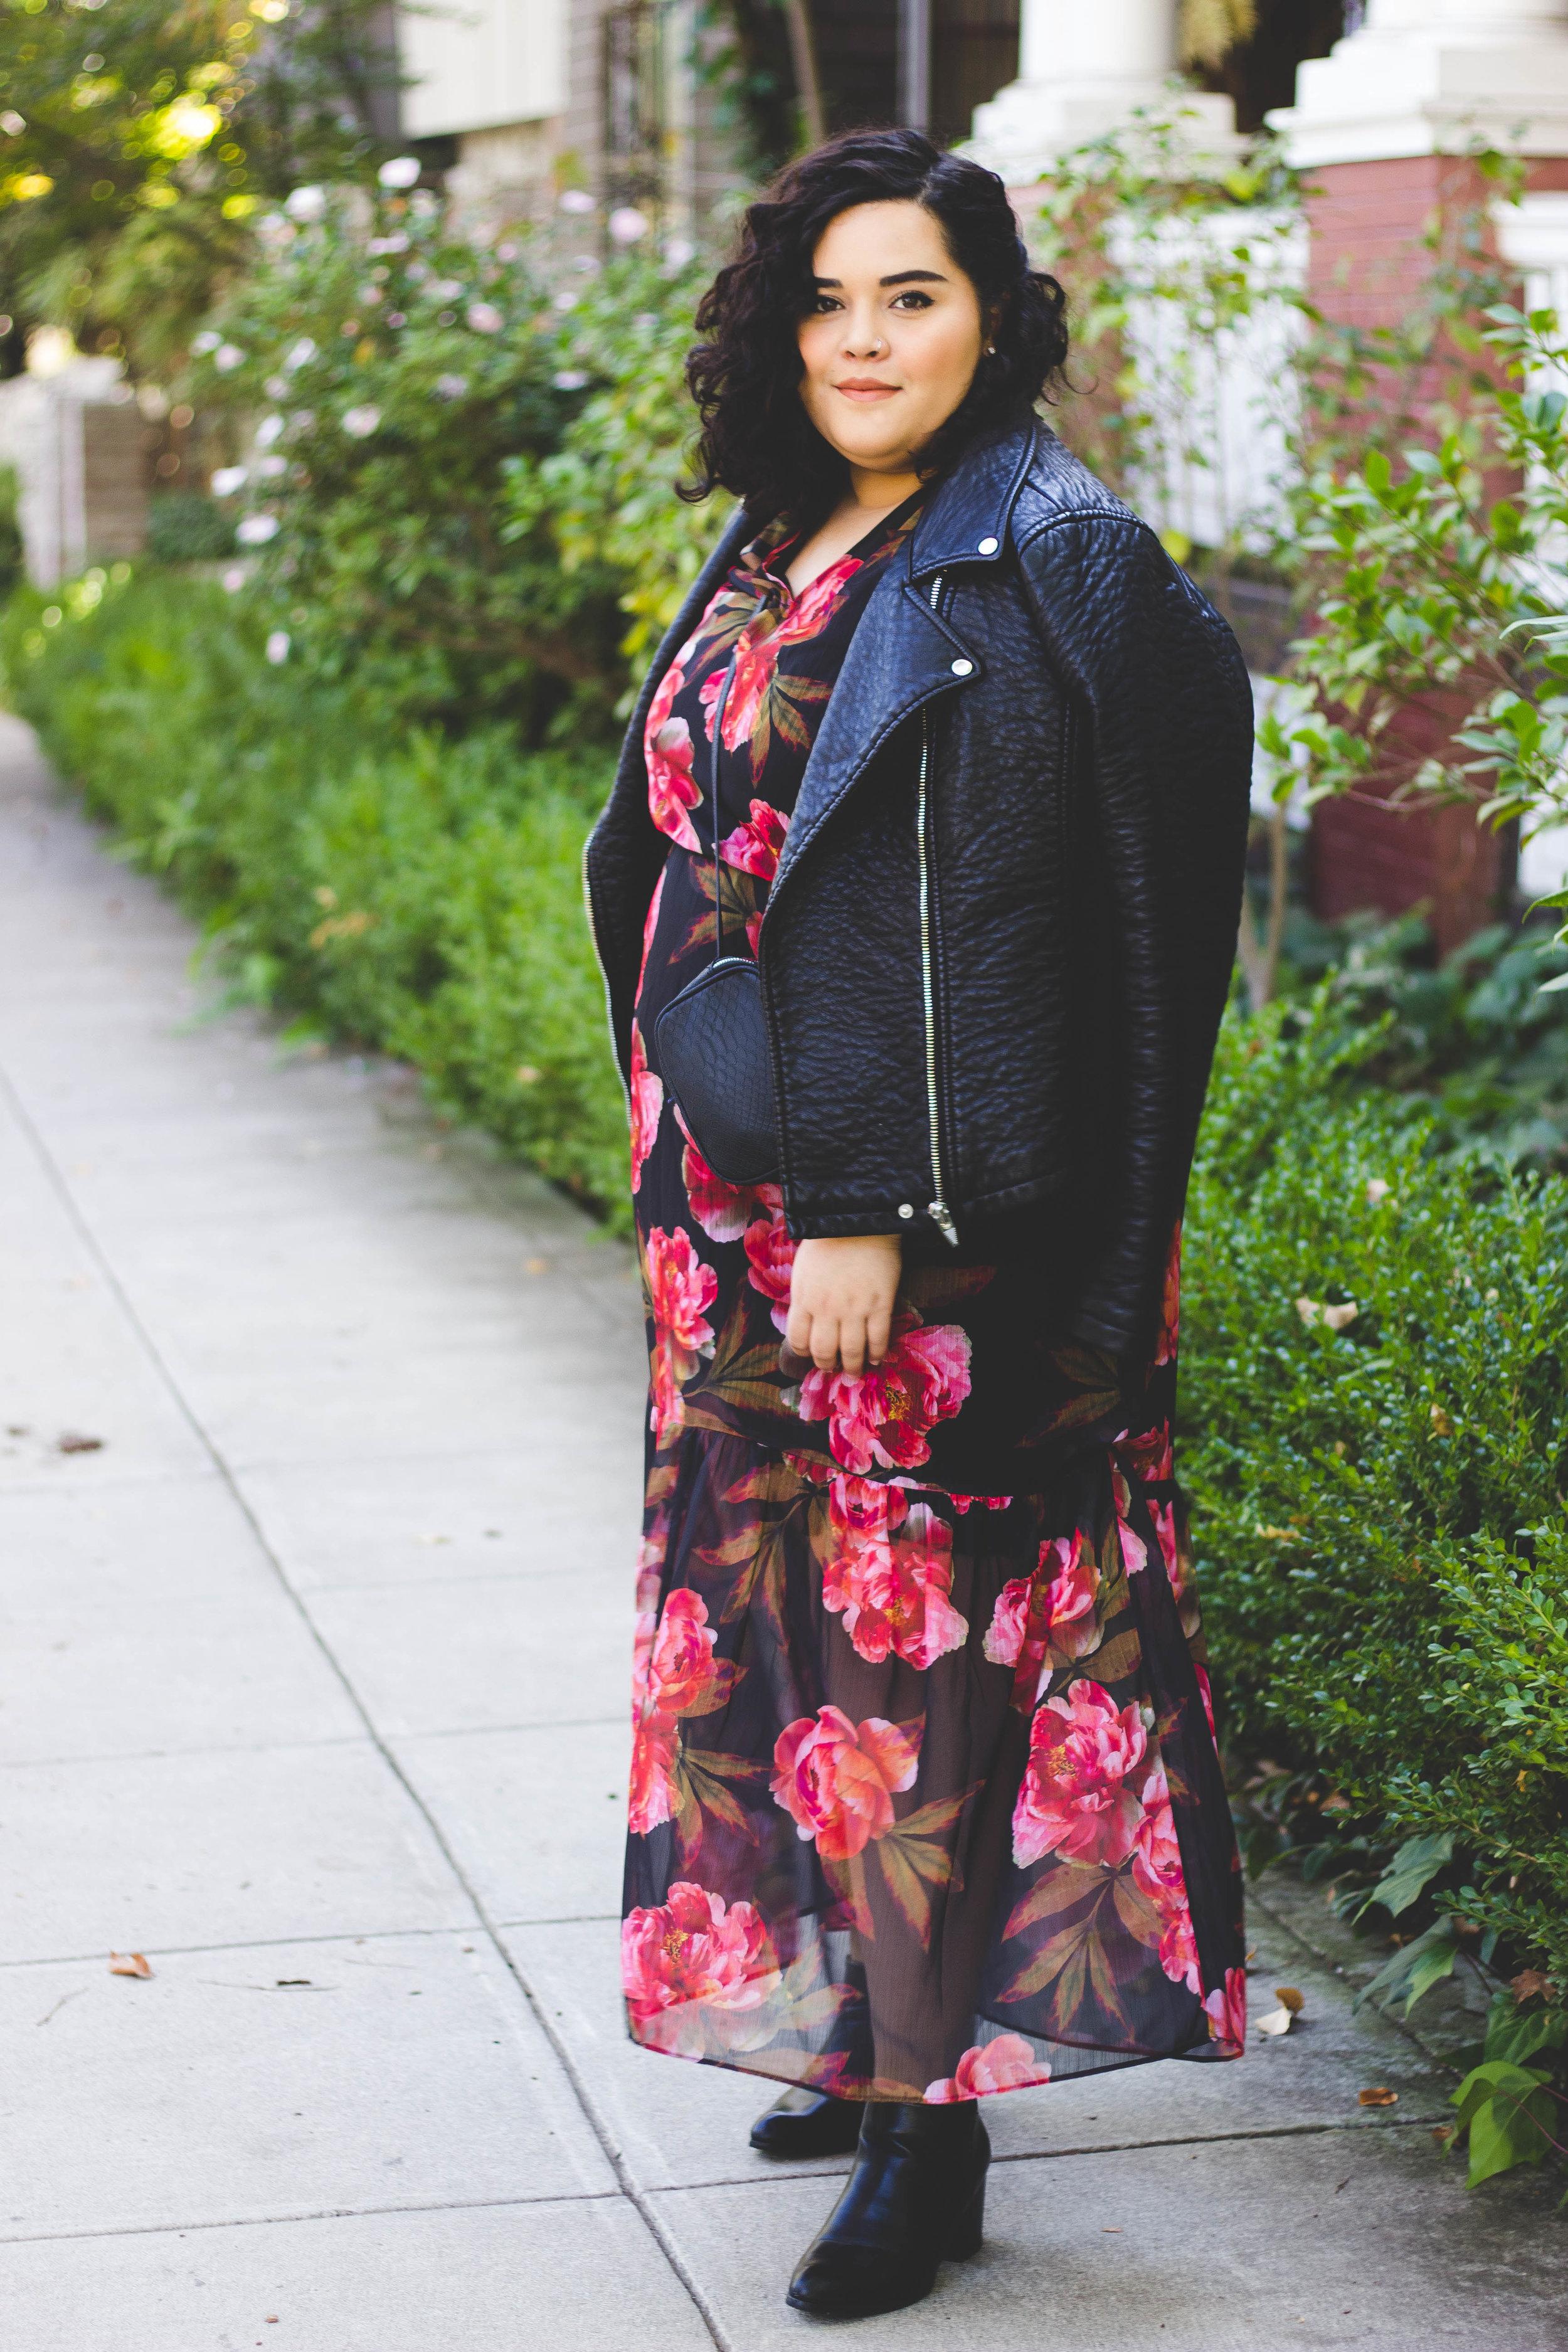 FloralDressWLeatherJacket (4 of 53).jpg